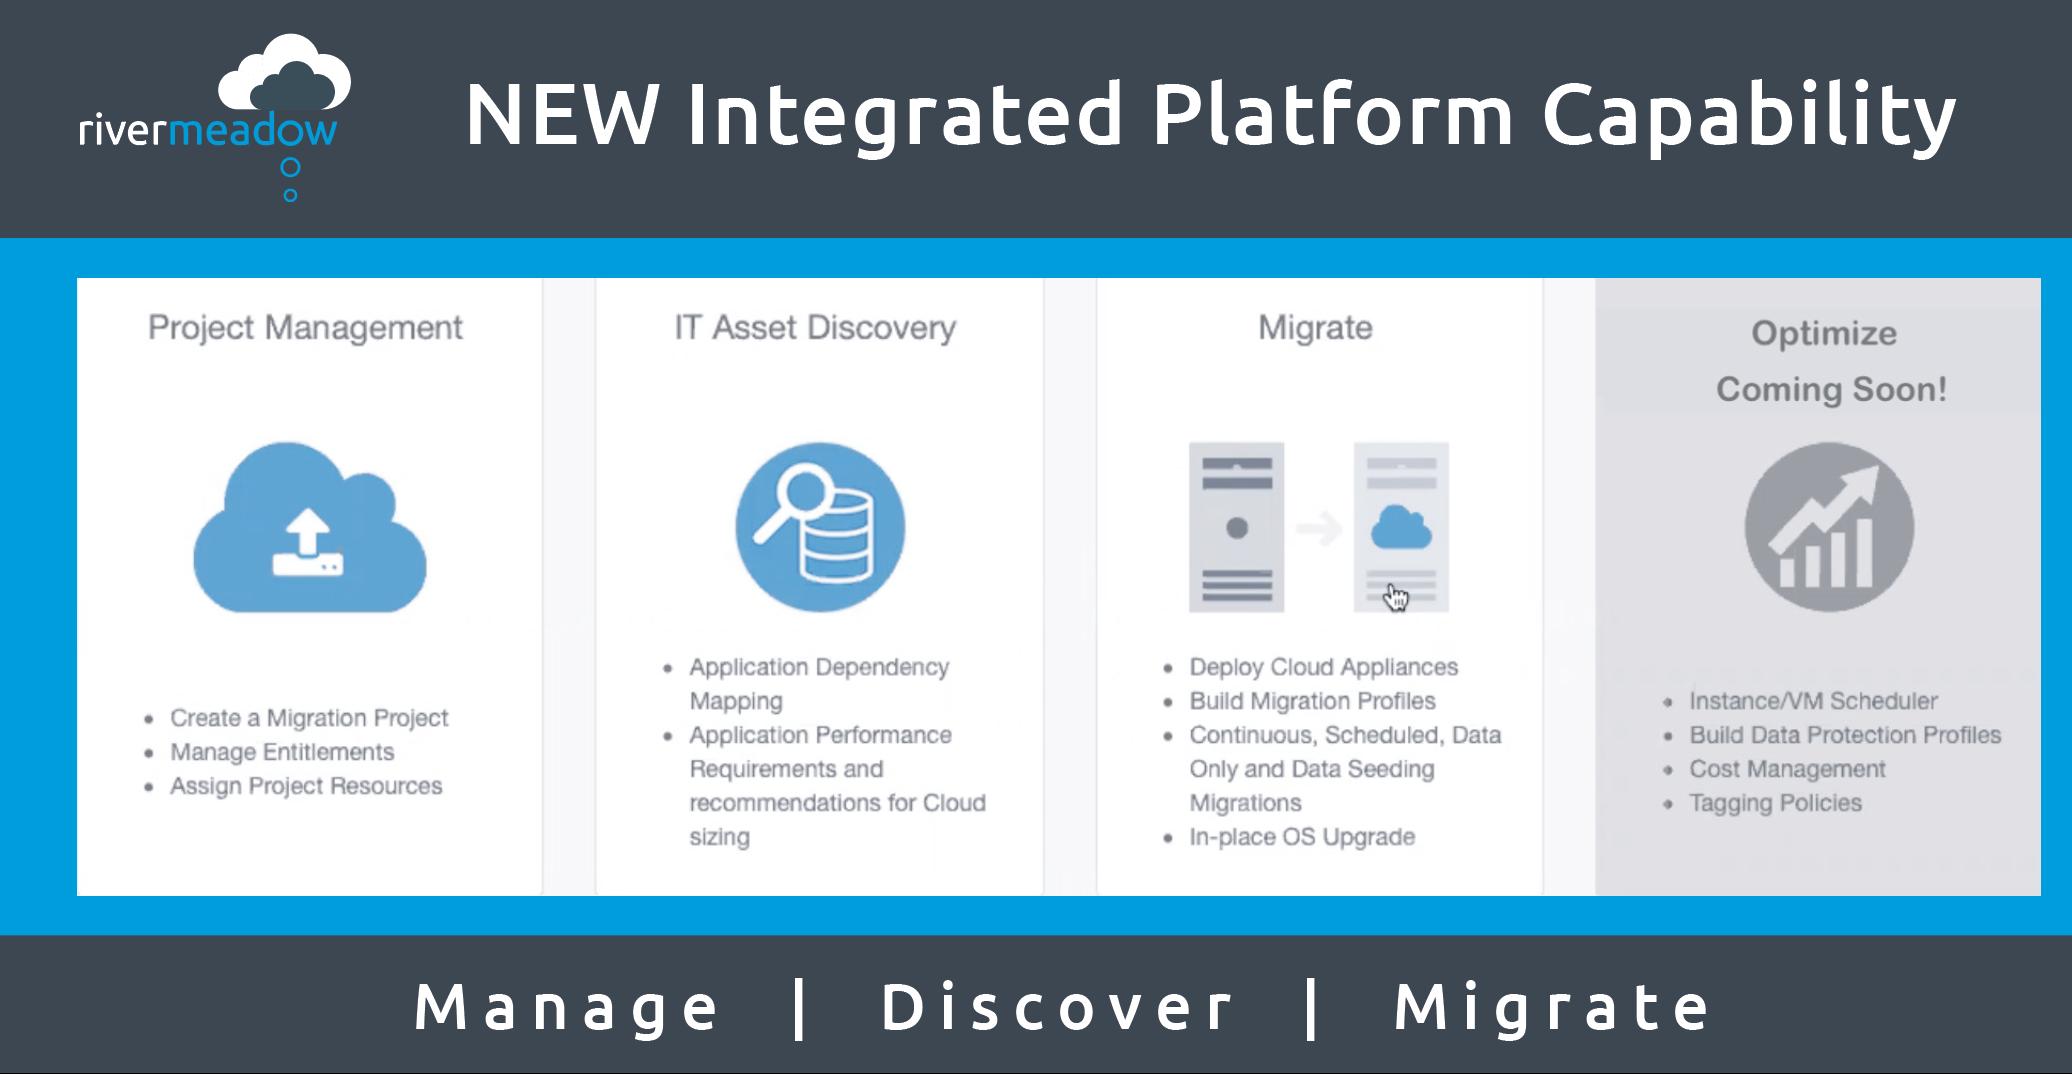 RiverMeadow's New Integrated Platform Capability